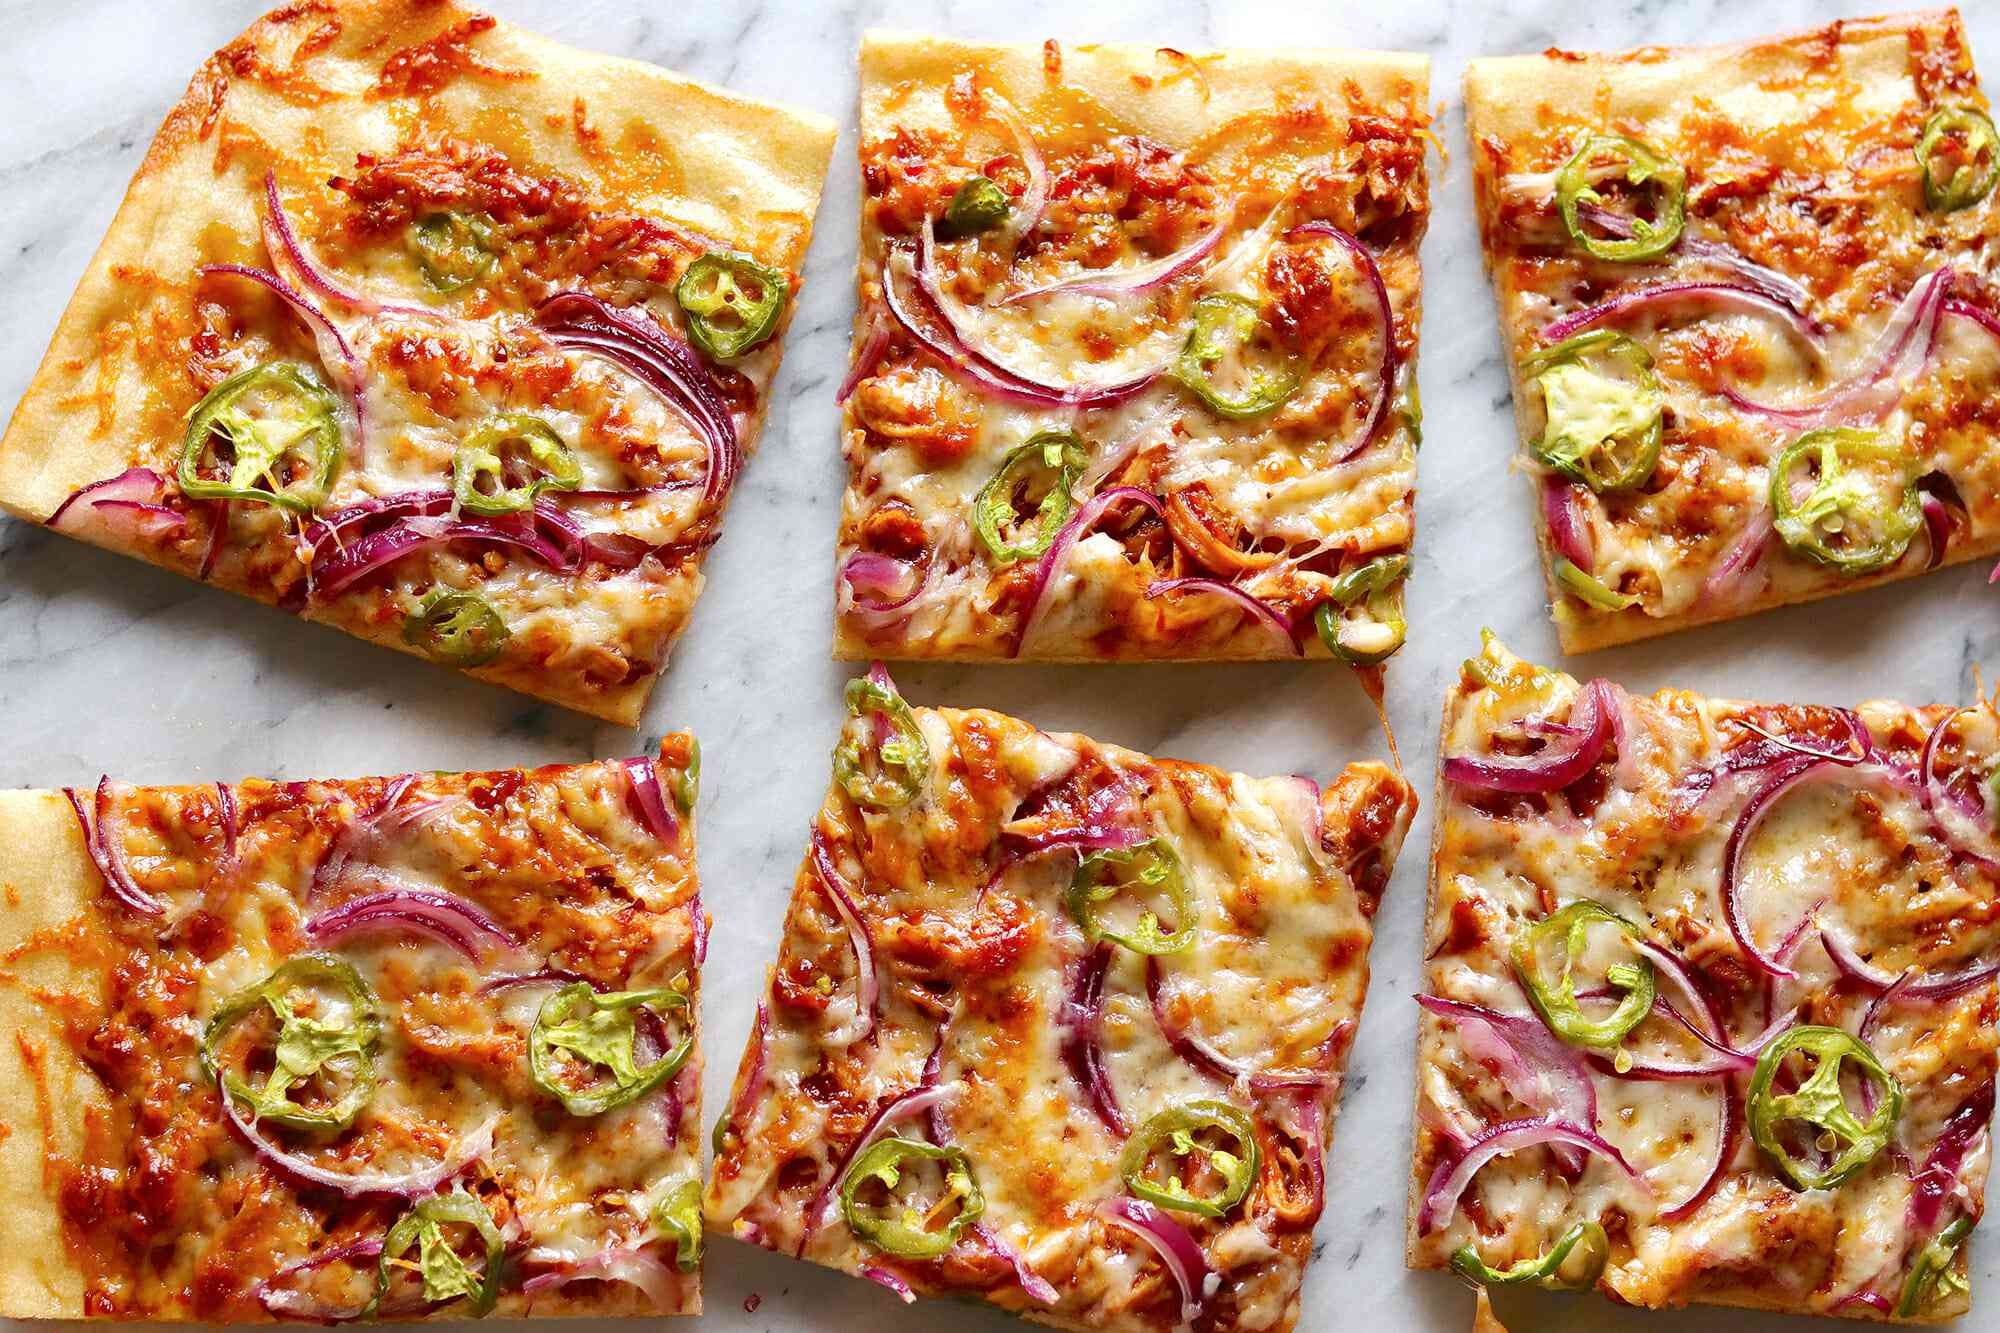 California Pizza Kitchen BBQ Chicken Pizza